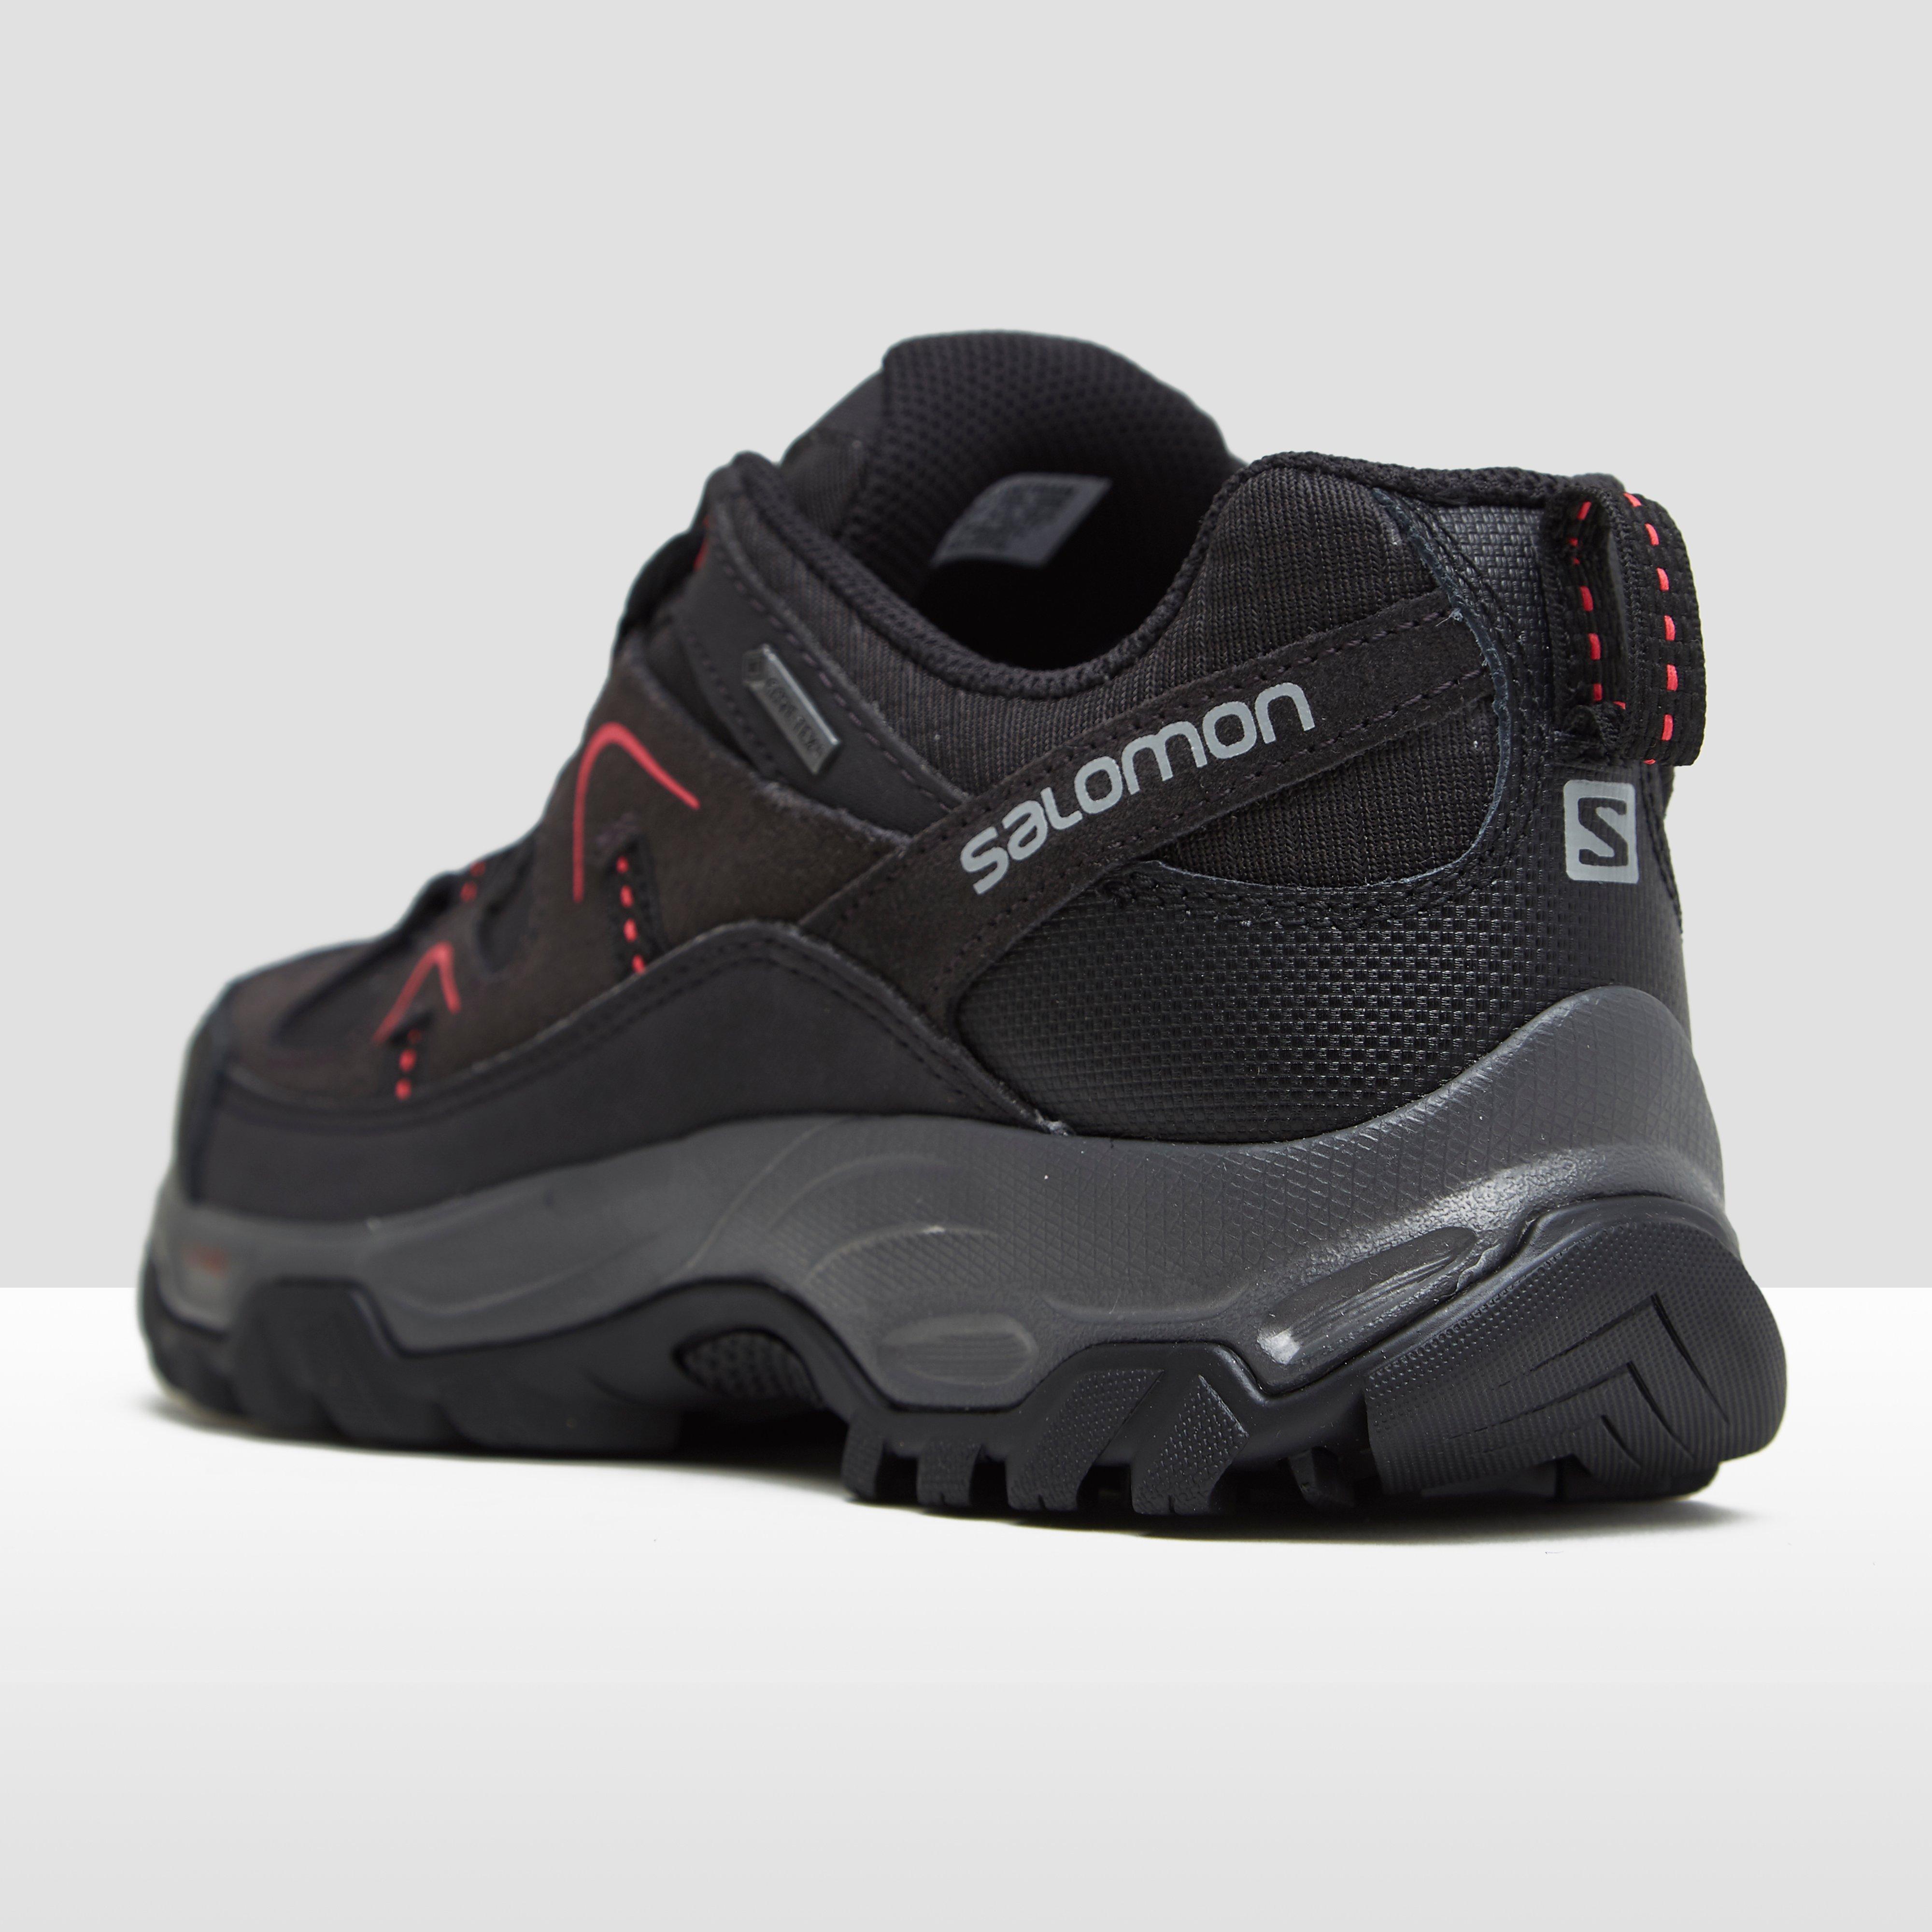 Brown Chaussures Salomon RqYDcKy76w